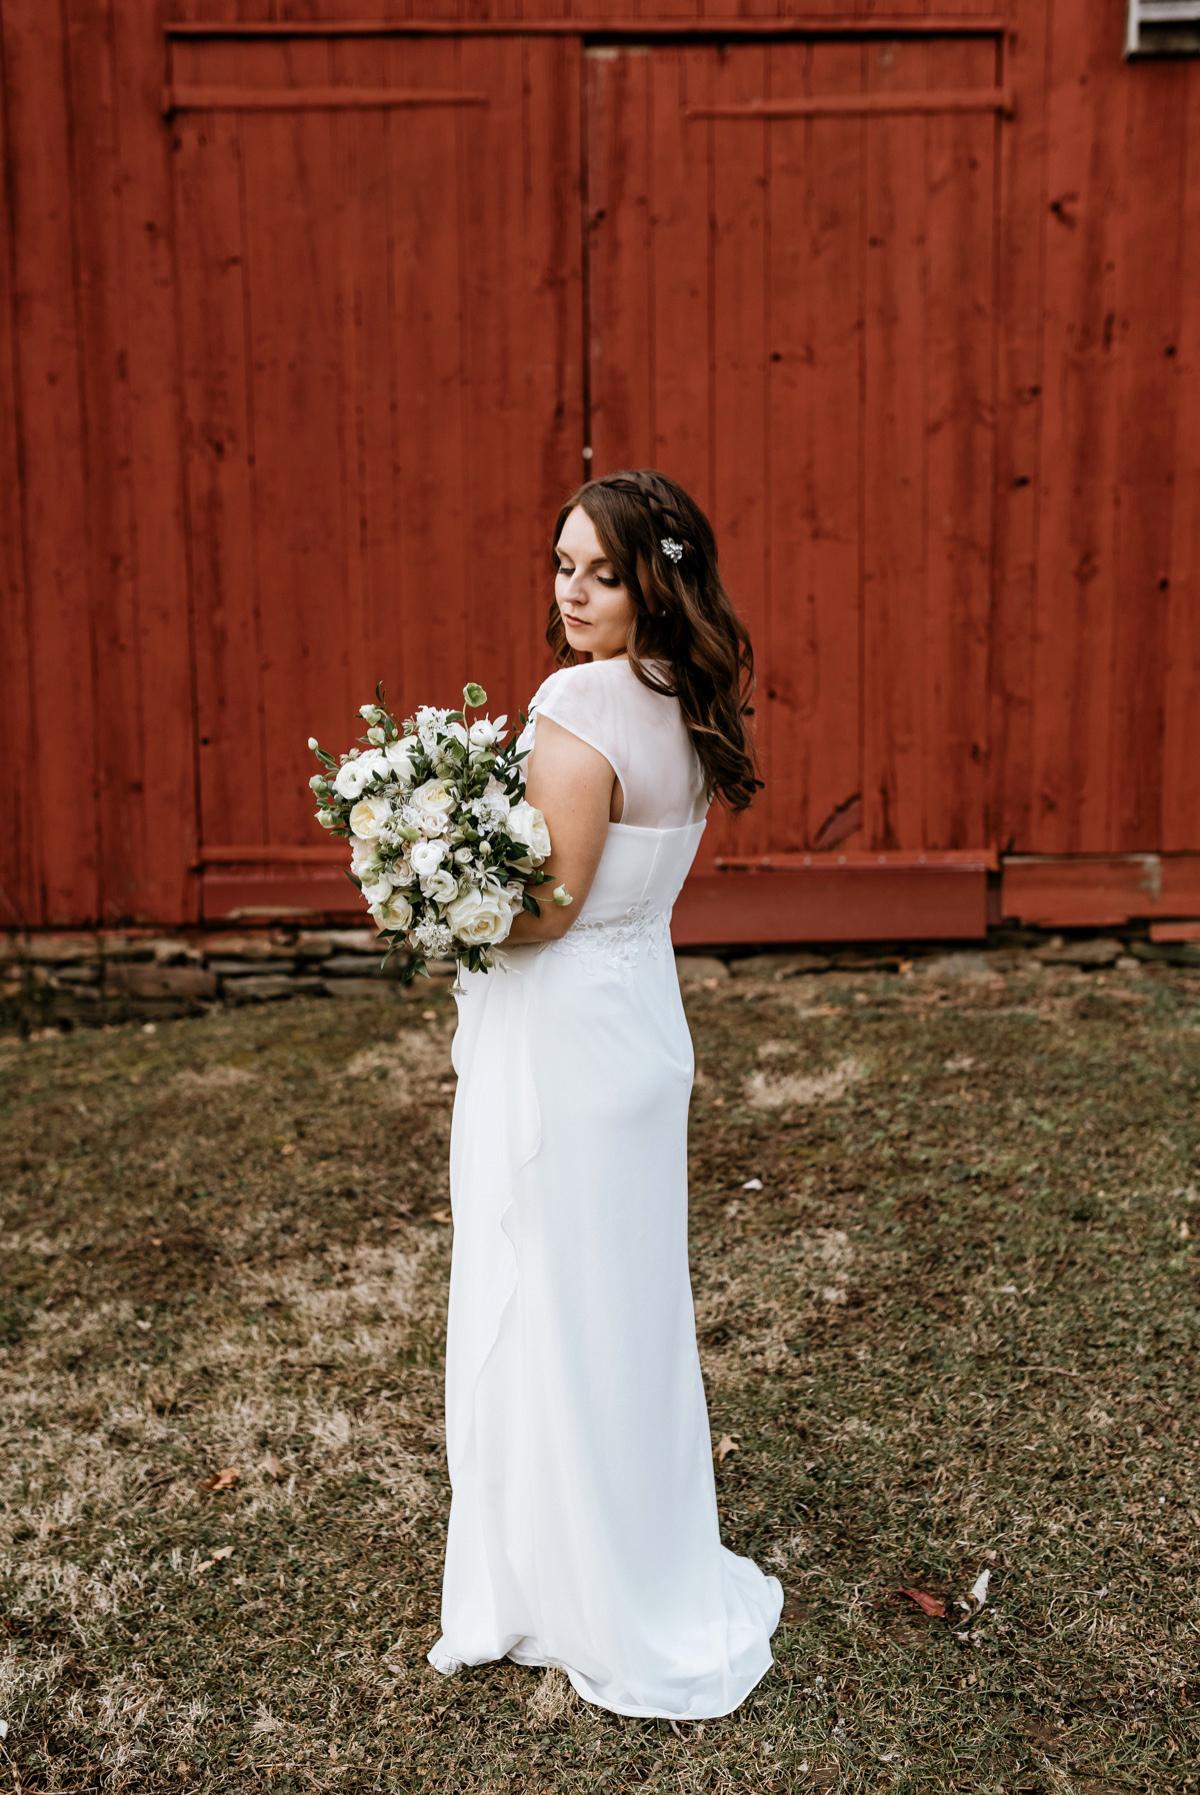 33 Vermont Wedding Photographer The Inn At Glencairn Barn Wedding Inspiration Winter Elopement Intimate Wedding